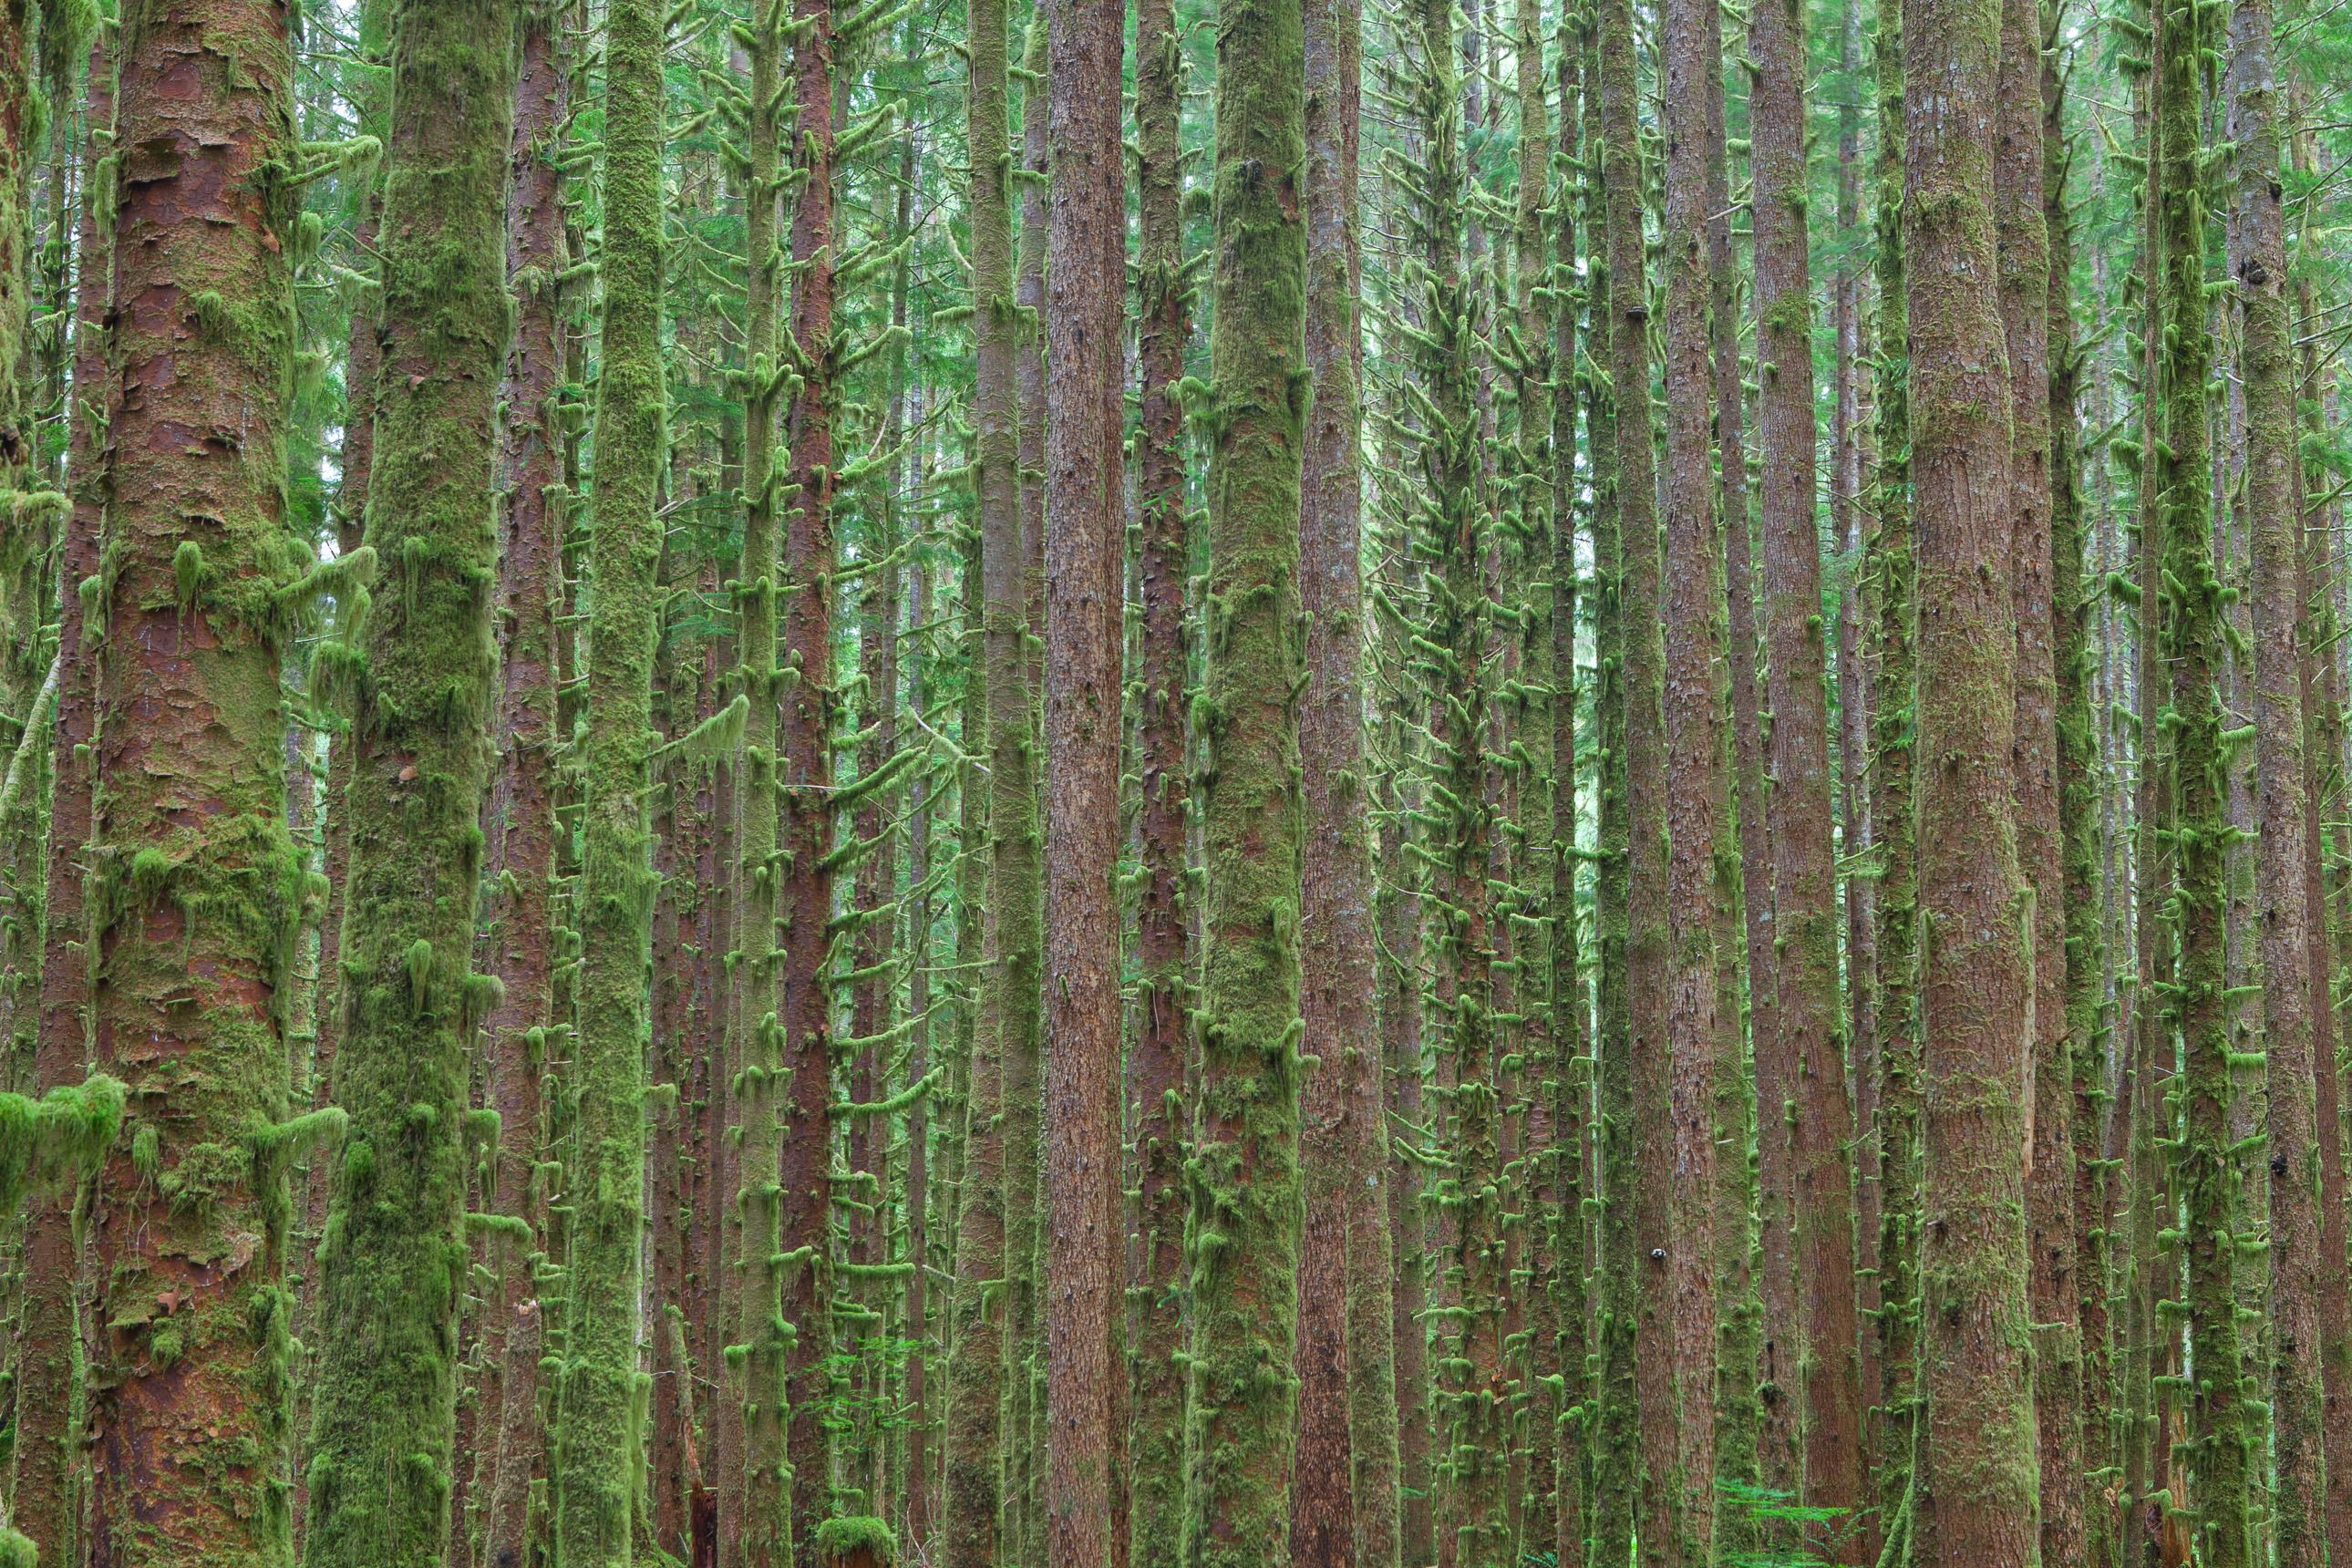 Hoh rainforest trees